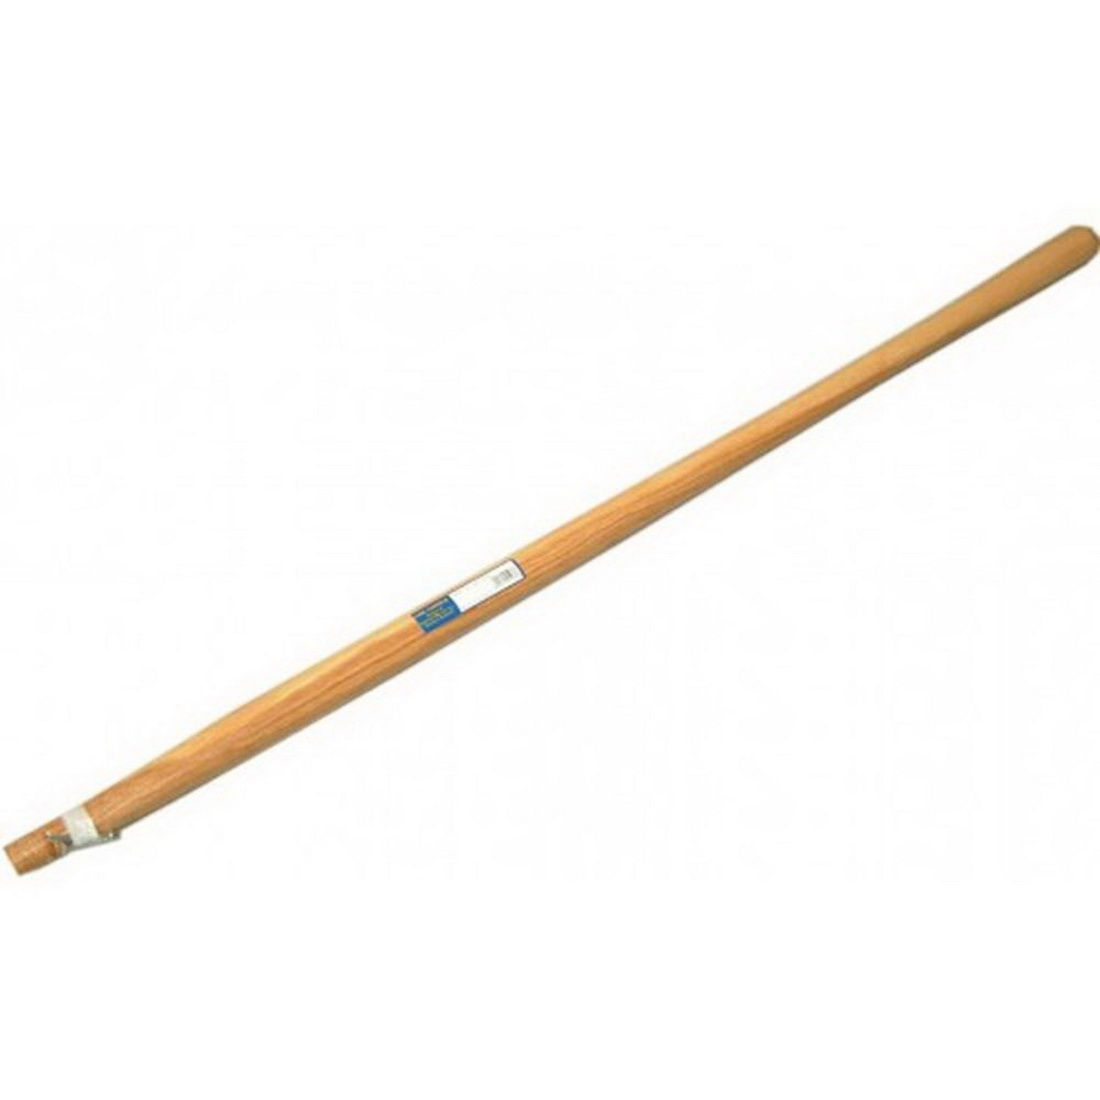 48in Single Bend Long Shovel Handle